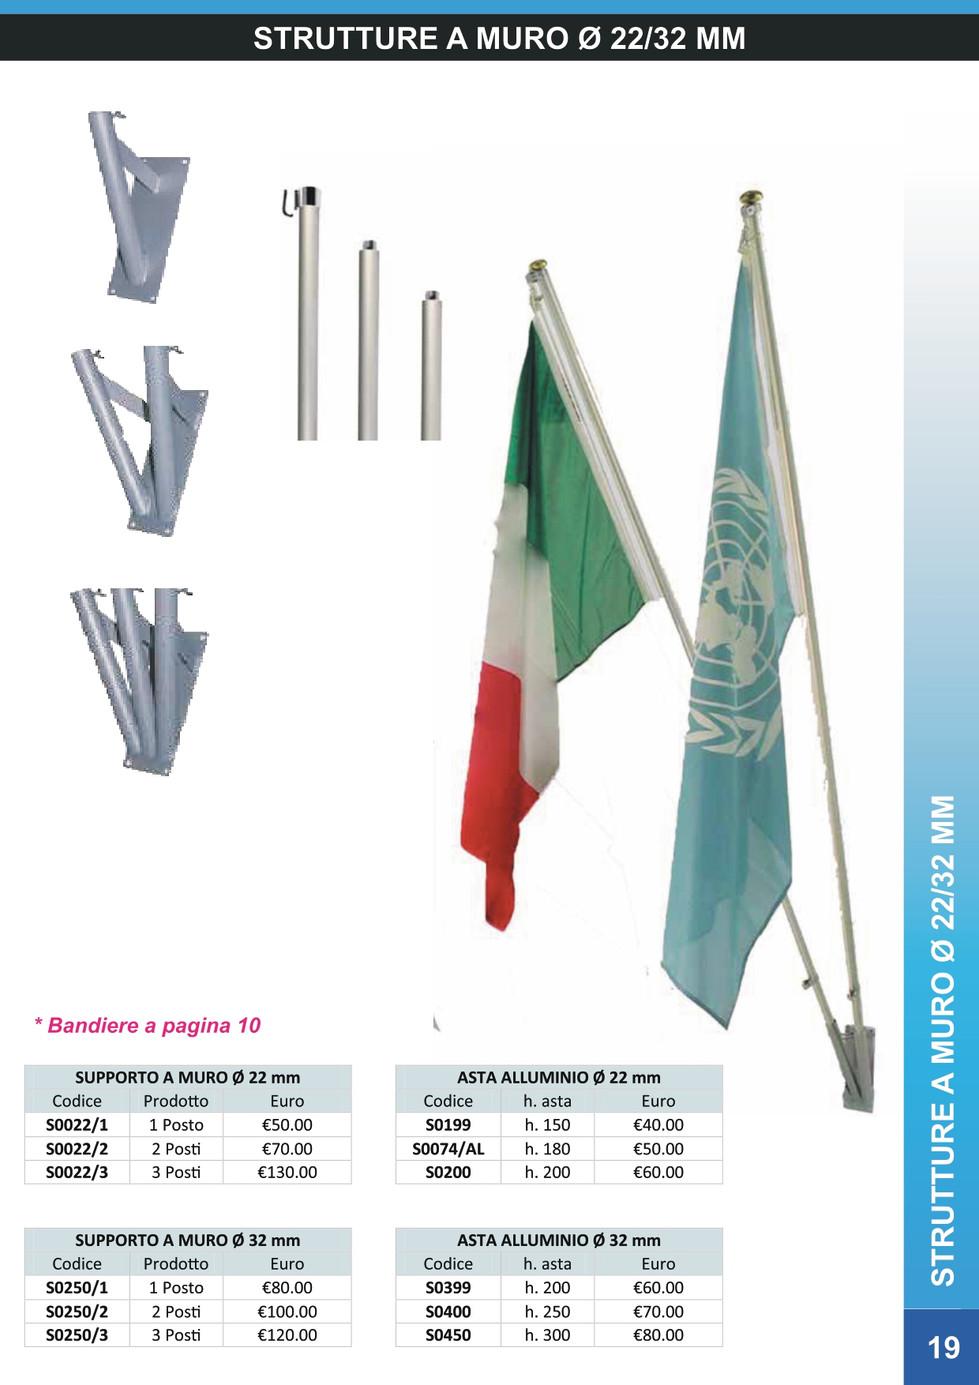 flagBandiere_page-0021.jpg